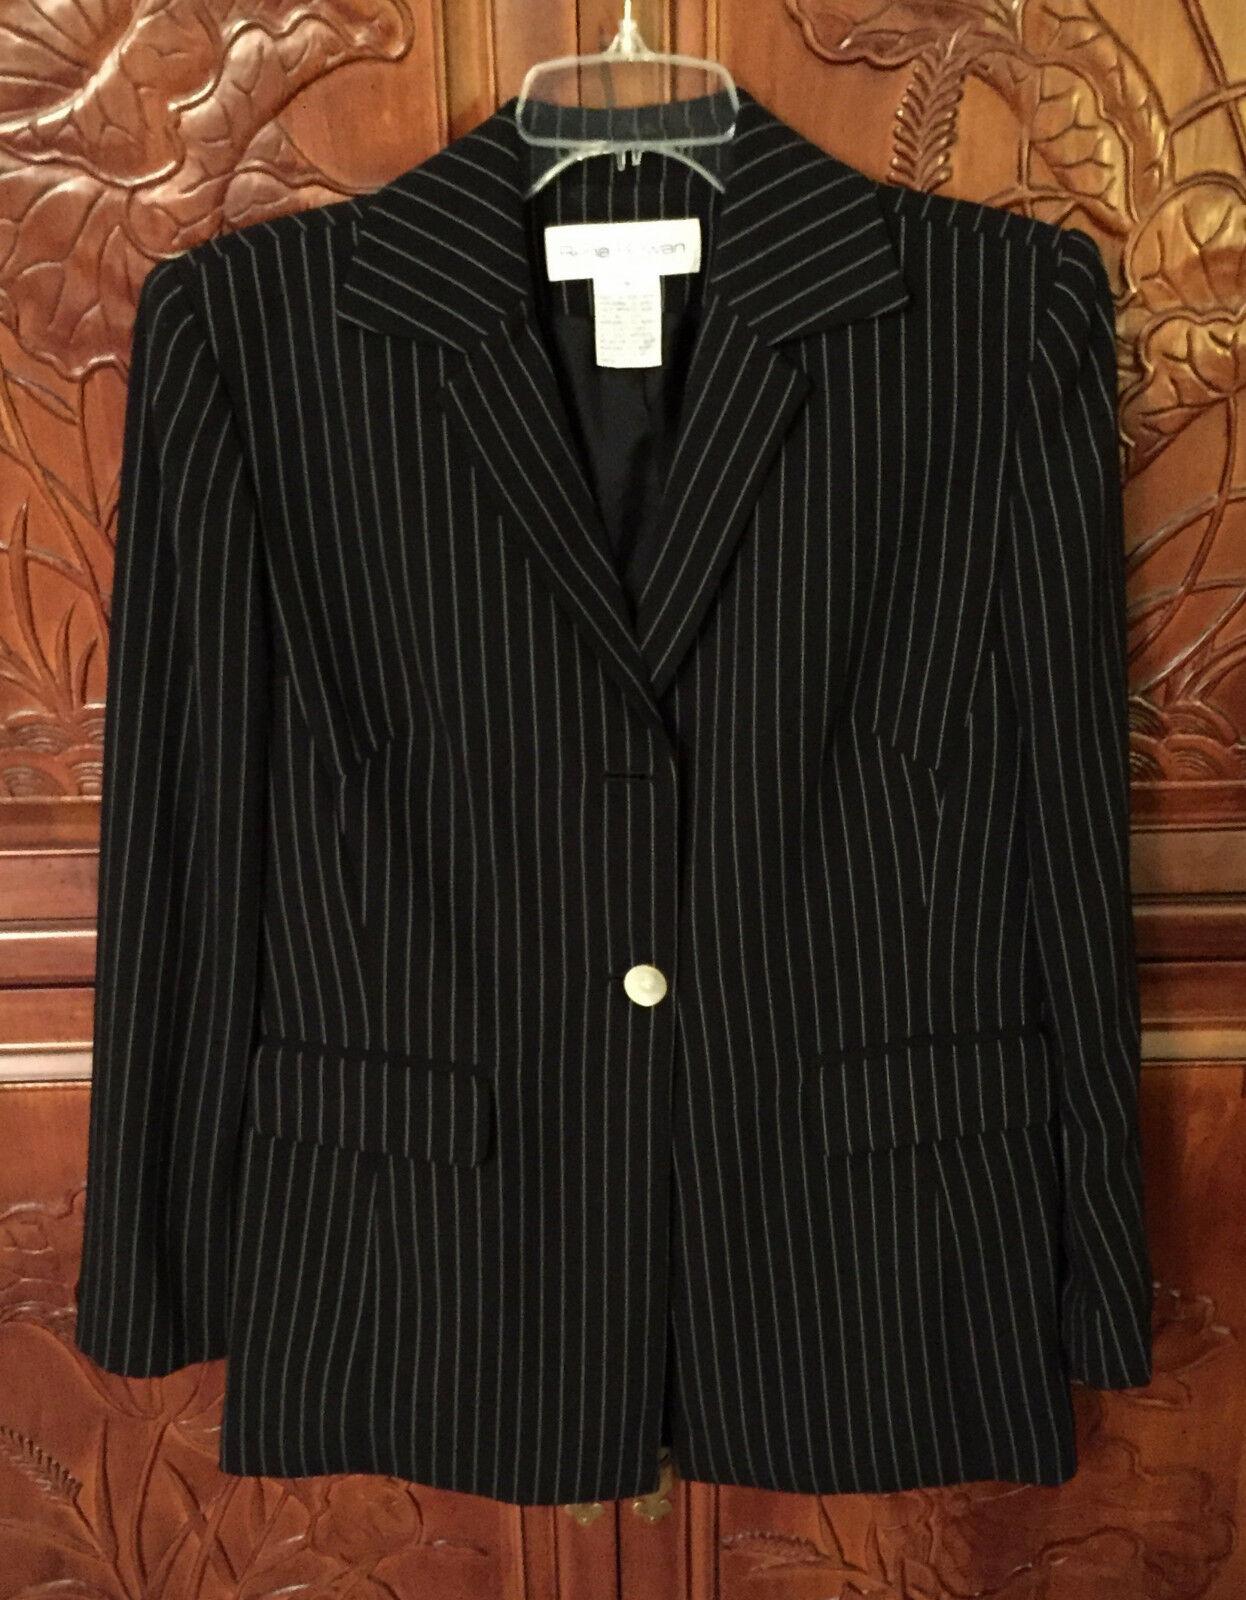 NWOT Set of Rena Rowan Suit & Pants Size 8 RT 199